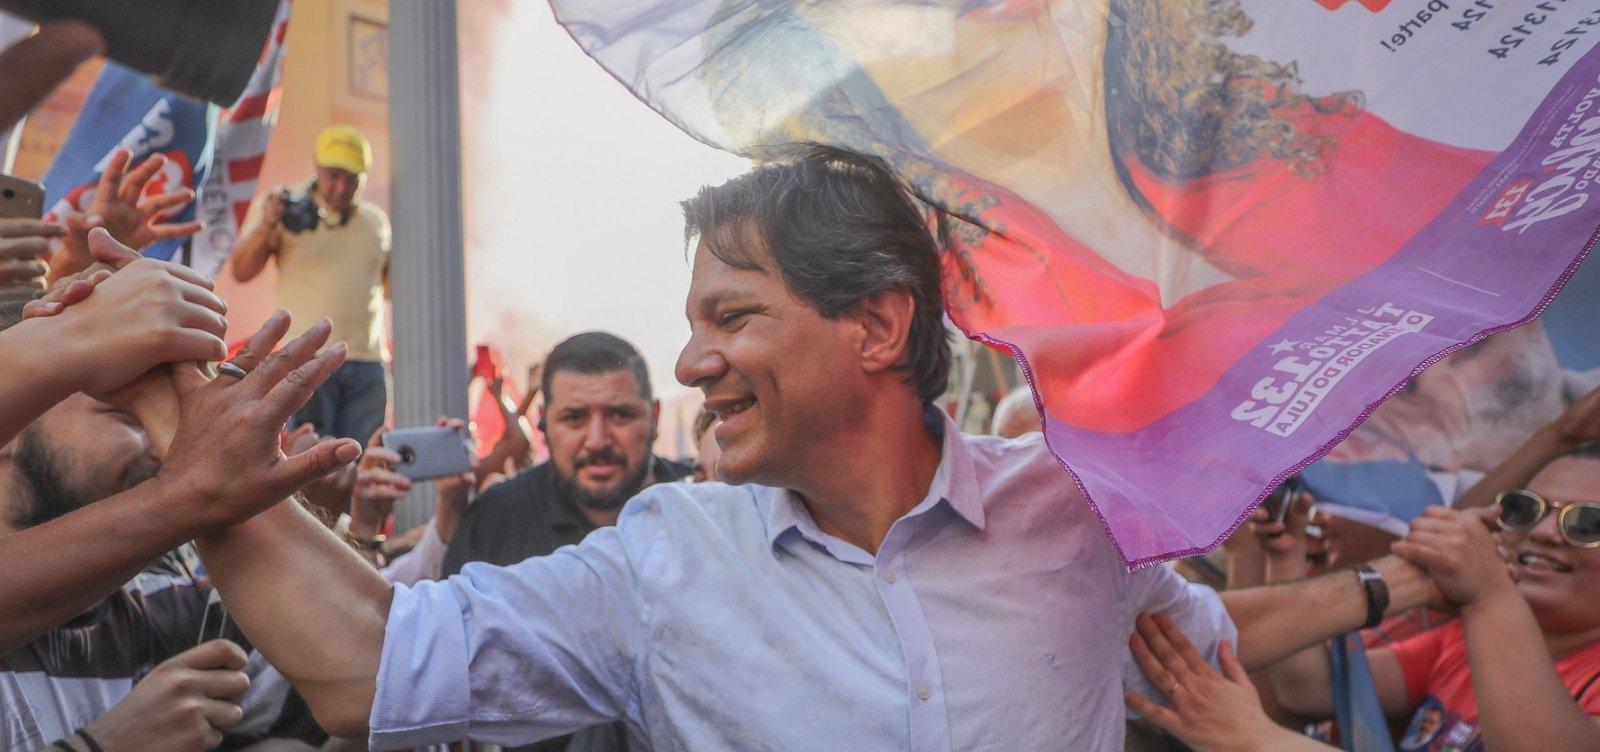 Haddad nomeia acusado de caixa 2 como tesoureiro da campanha